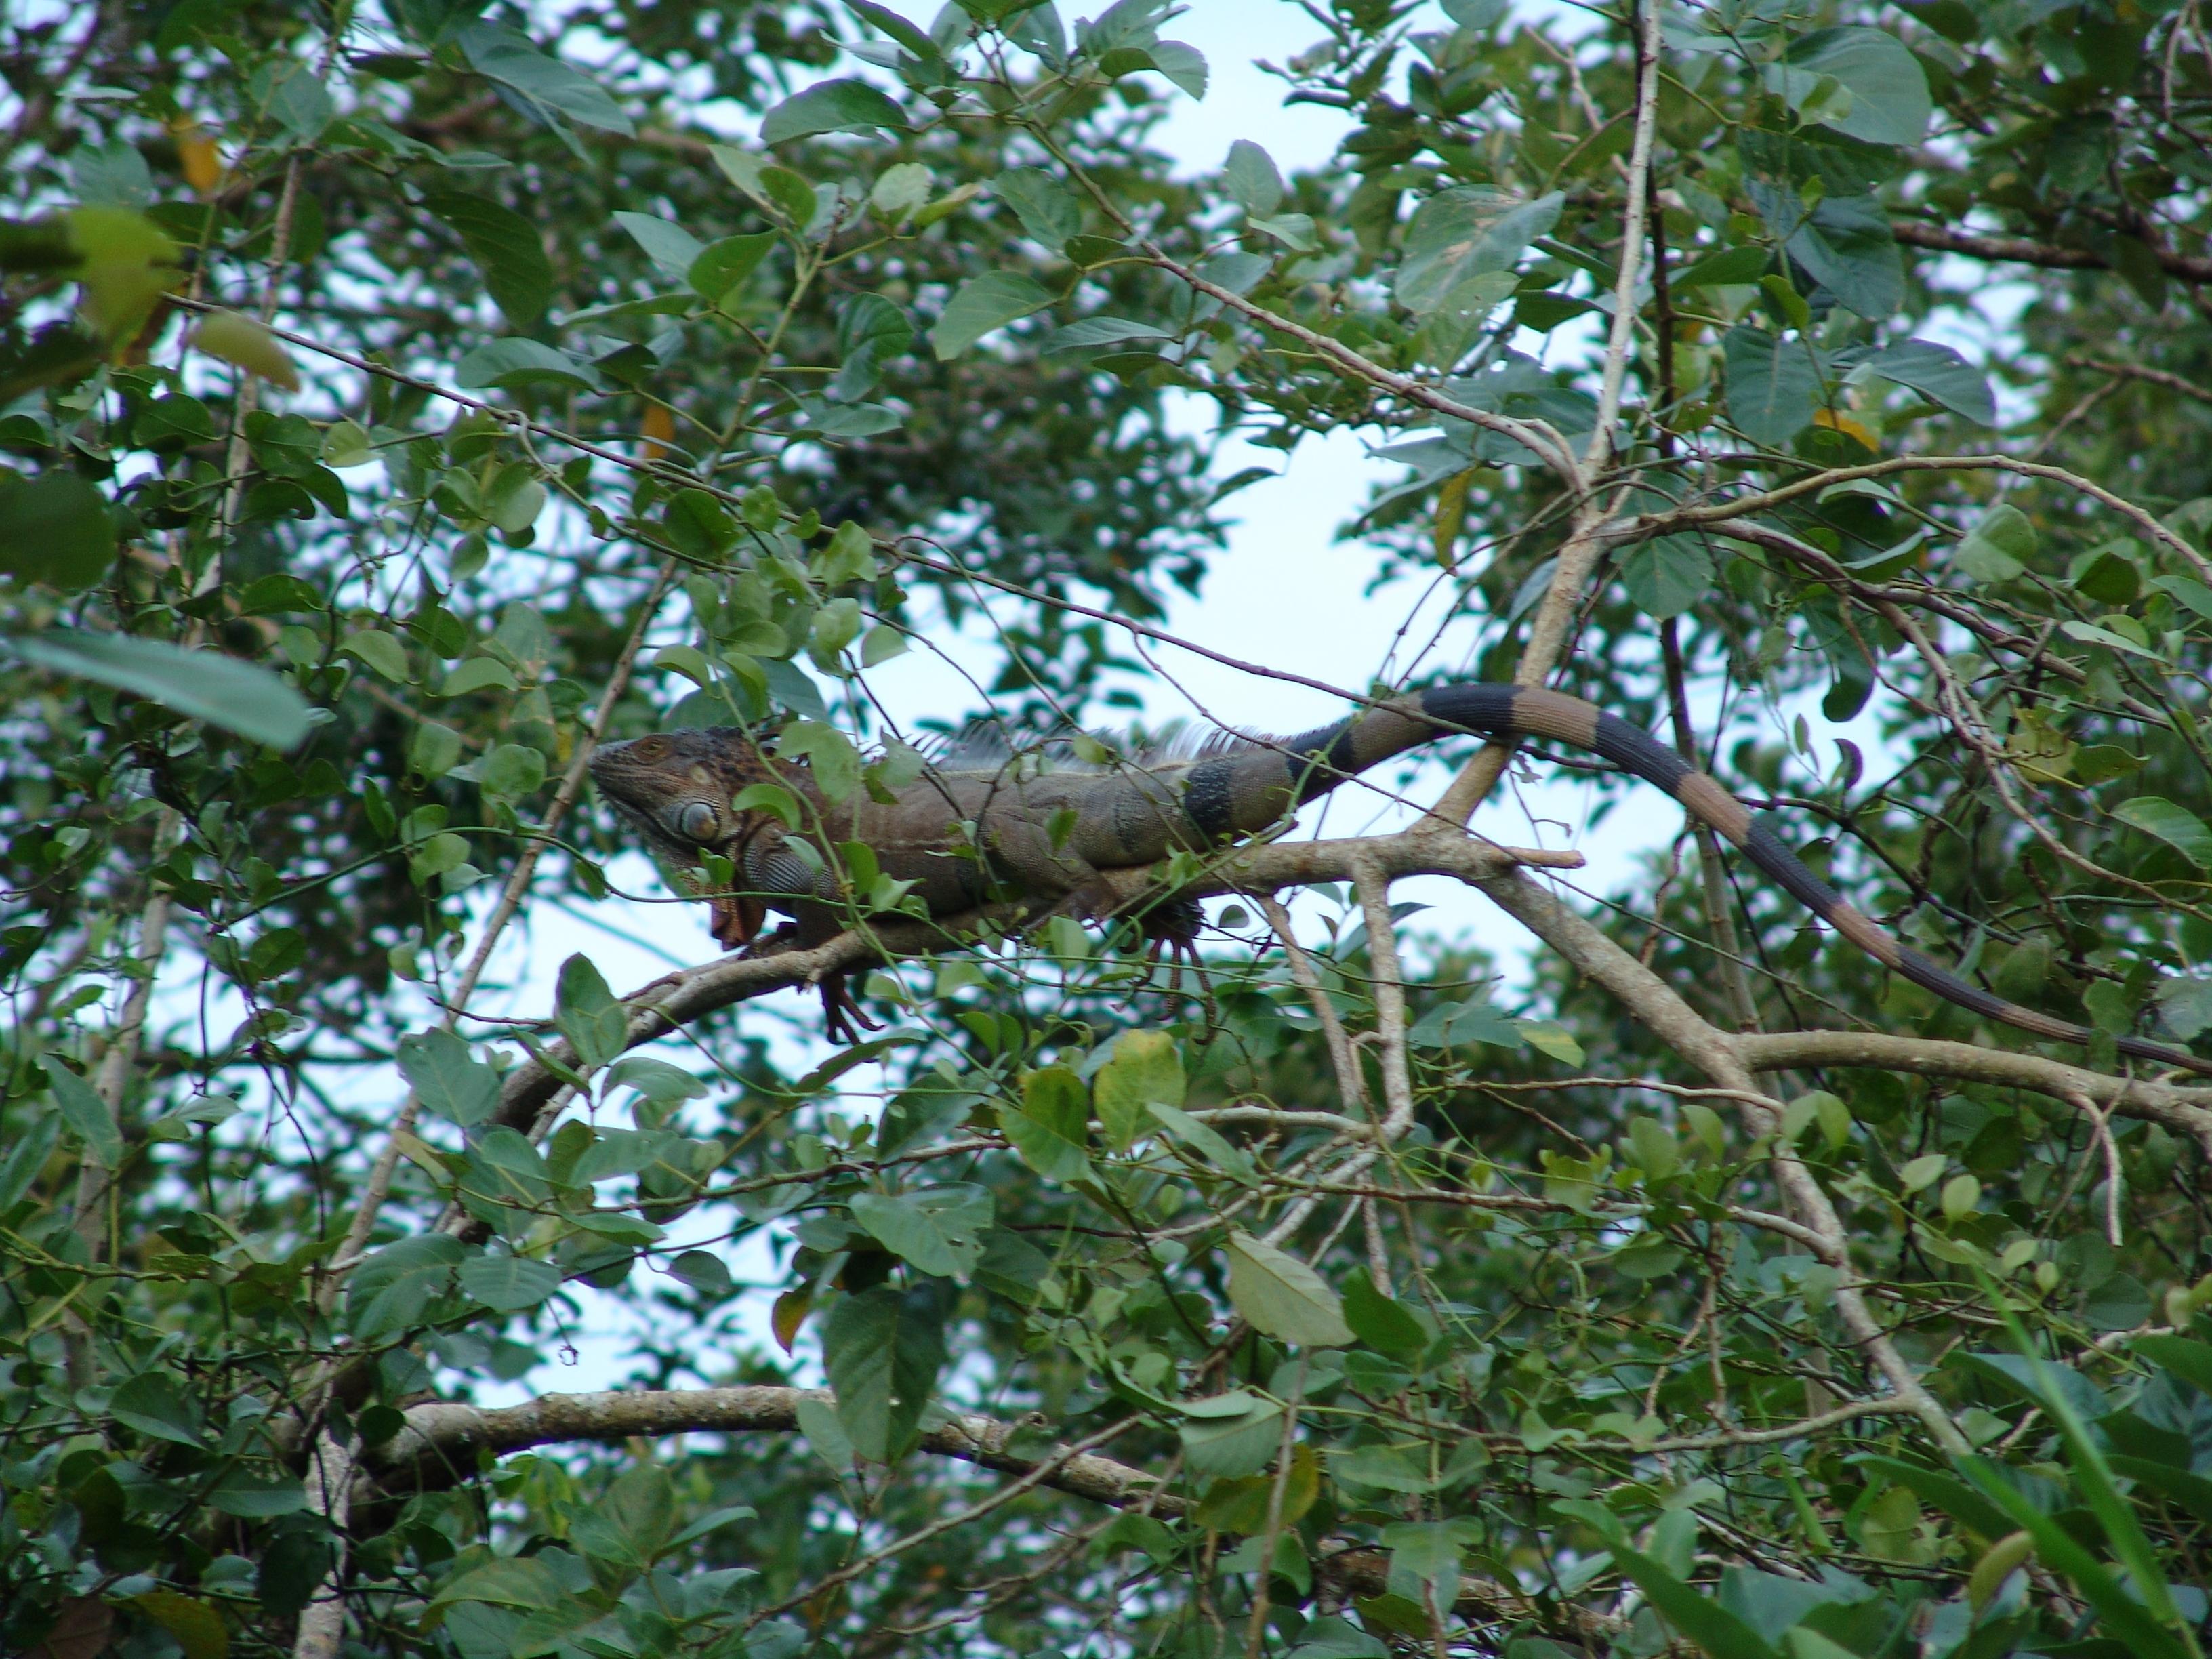 Iguana in the tree (Nicaragua)